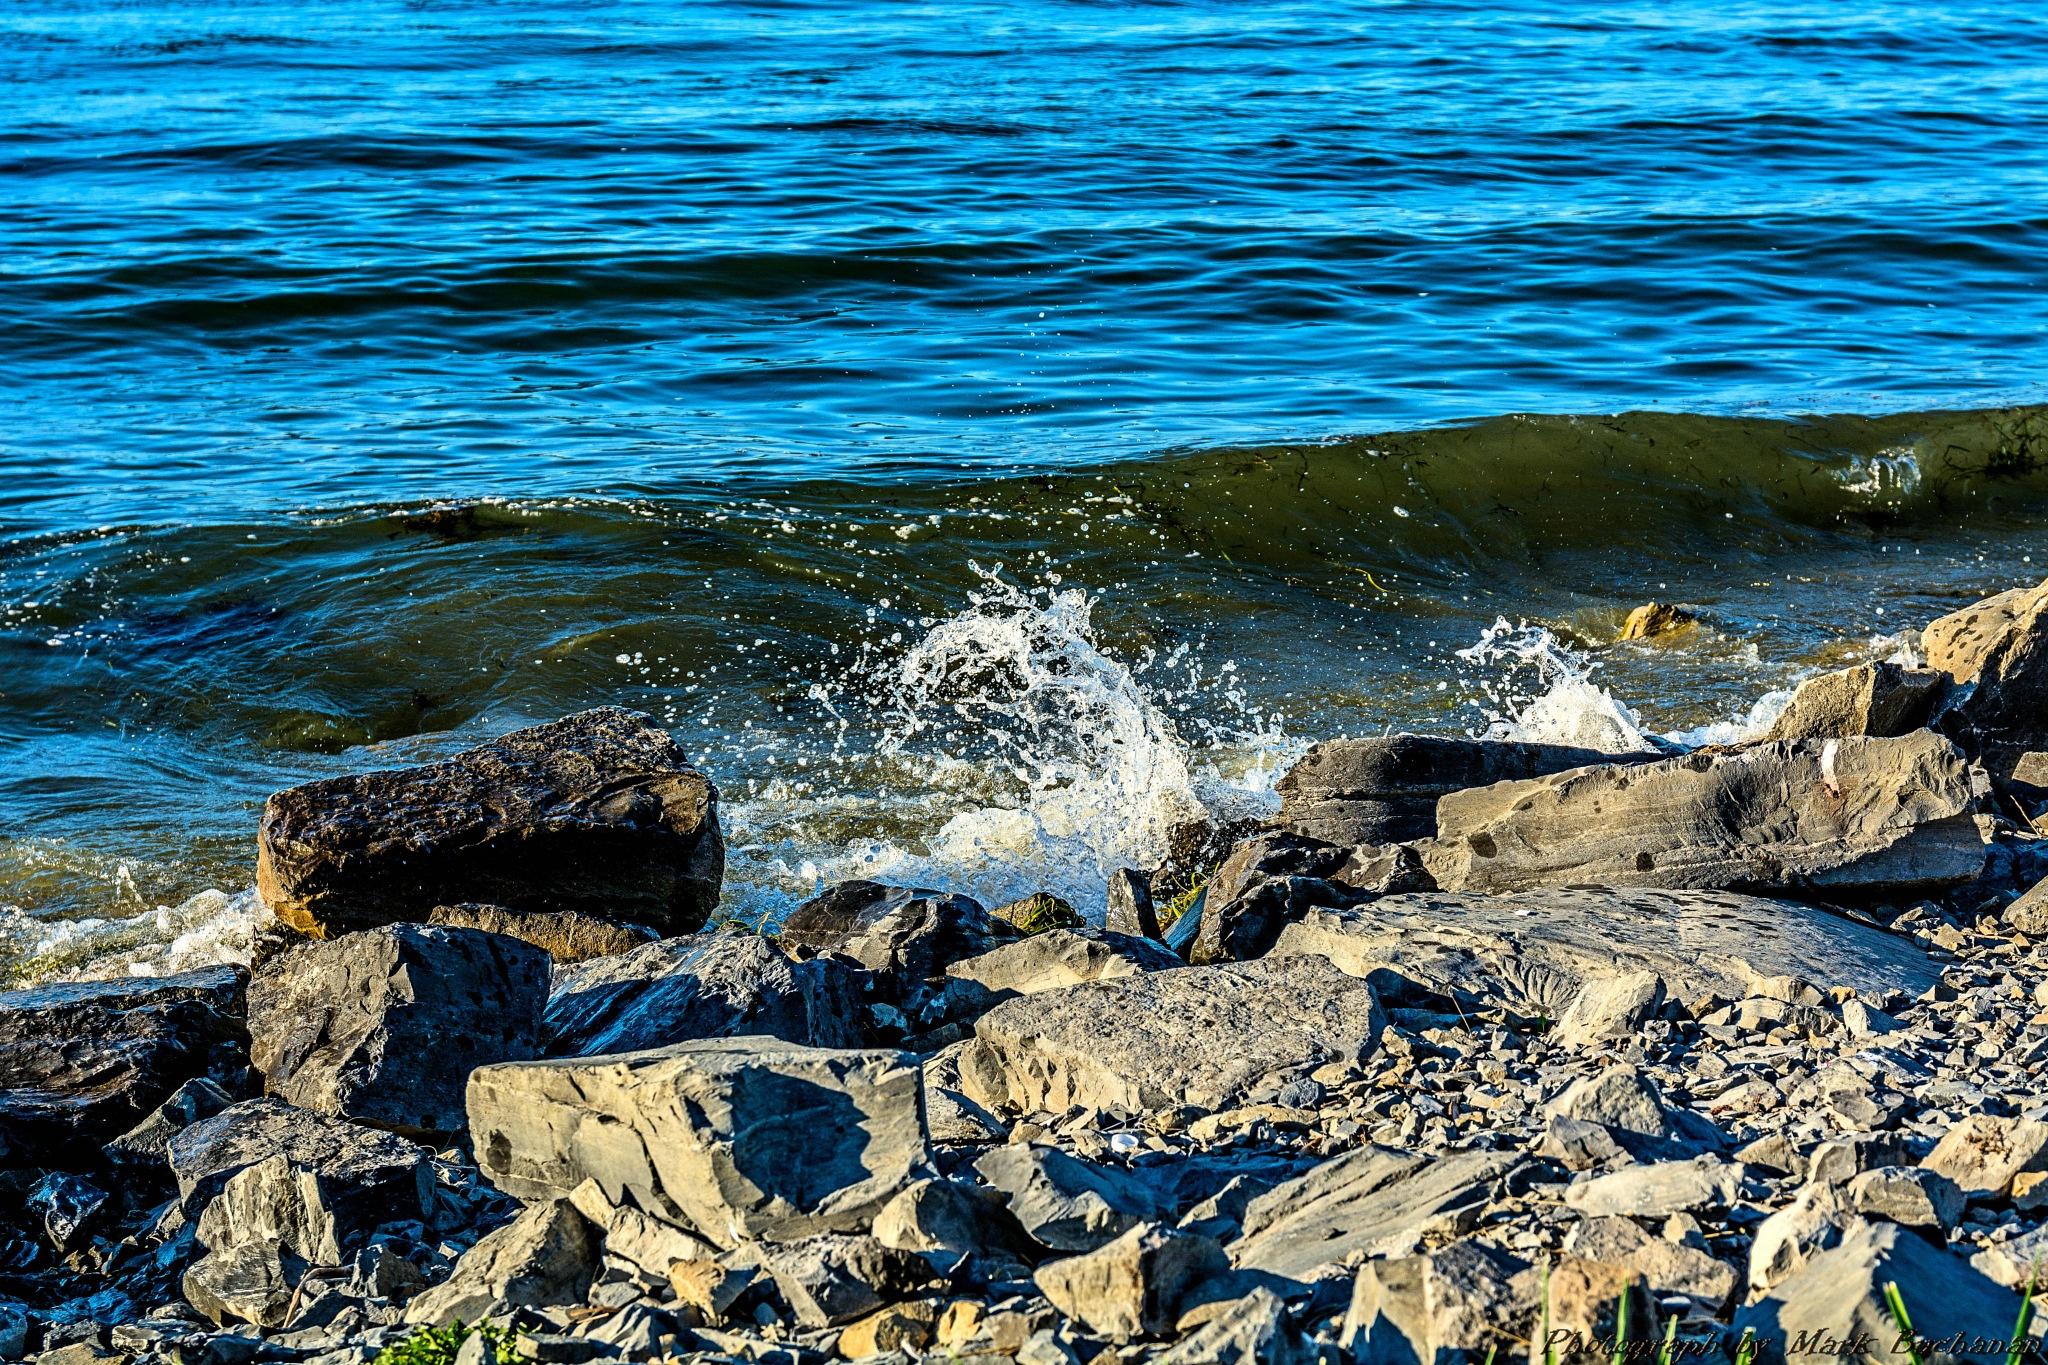 Splash #3 by Mark Buchanan